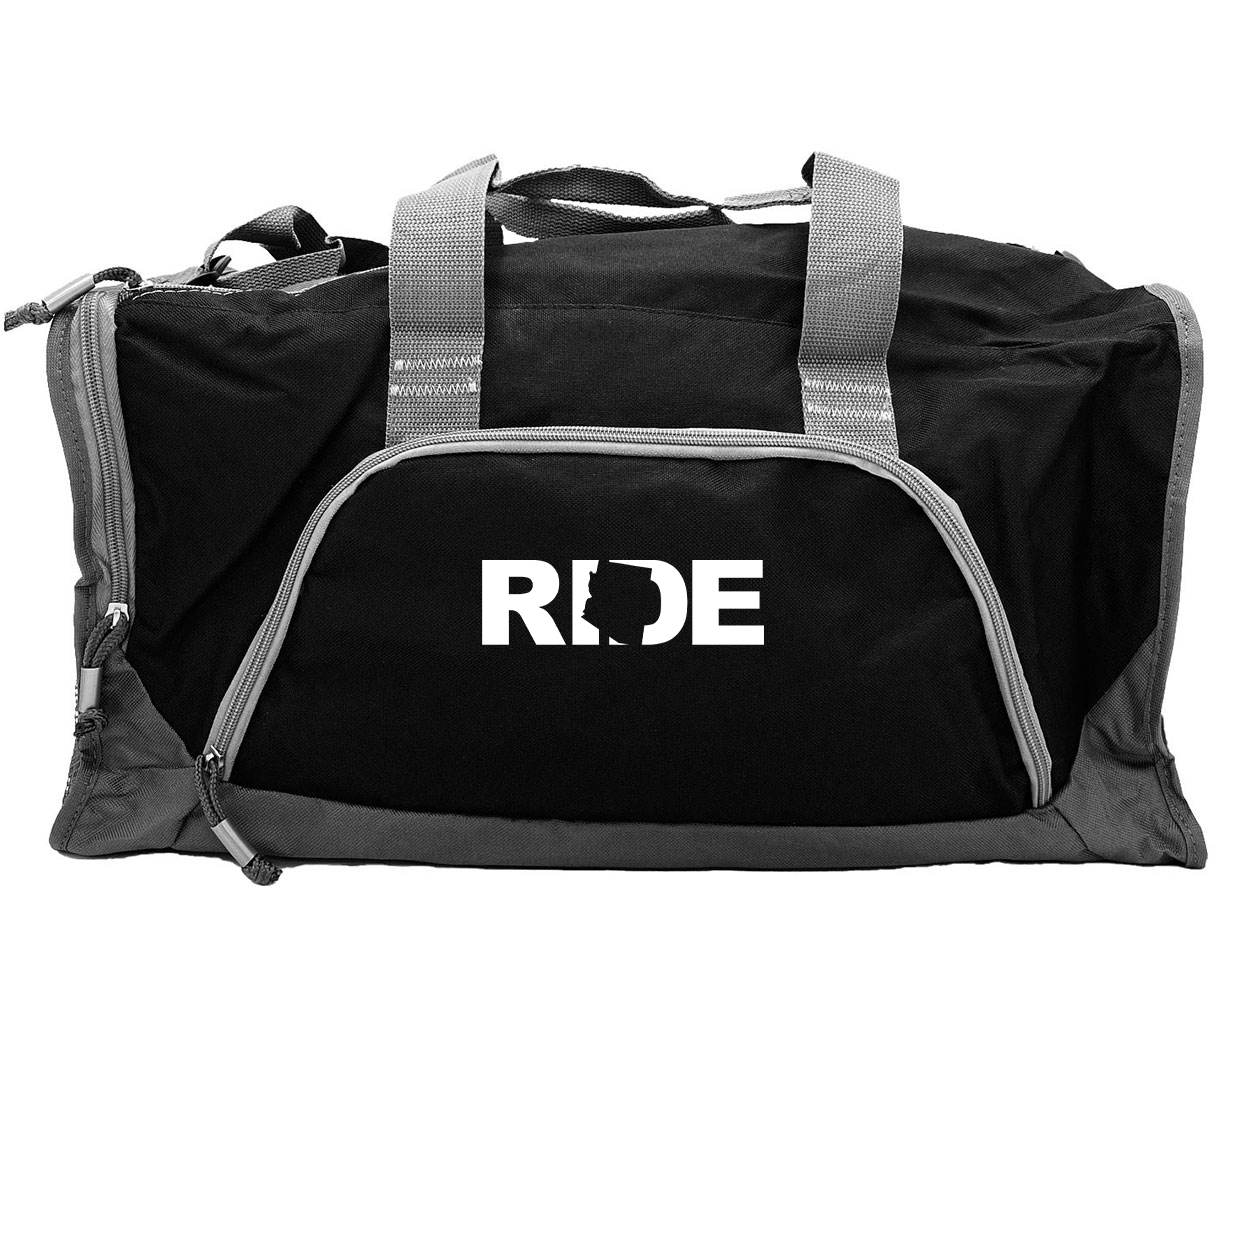 Ride Arizona Classic Rangeley Sport Duffel Bag Black (White Logo)